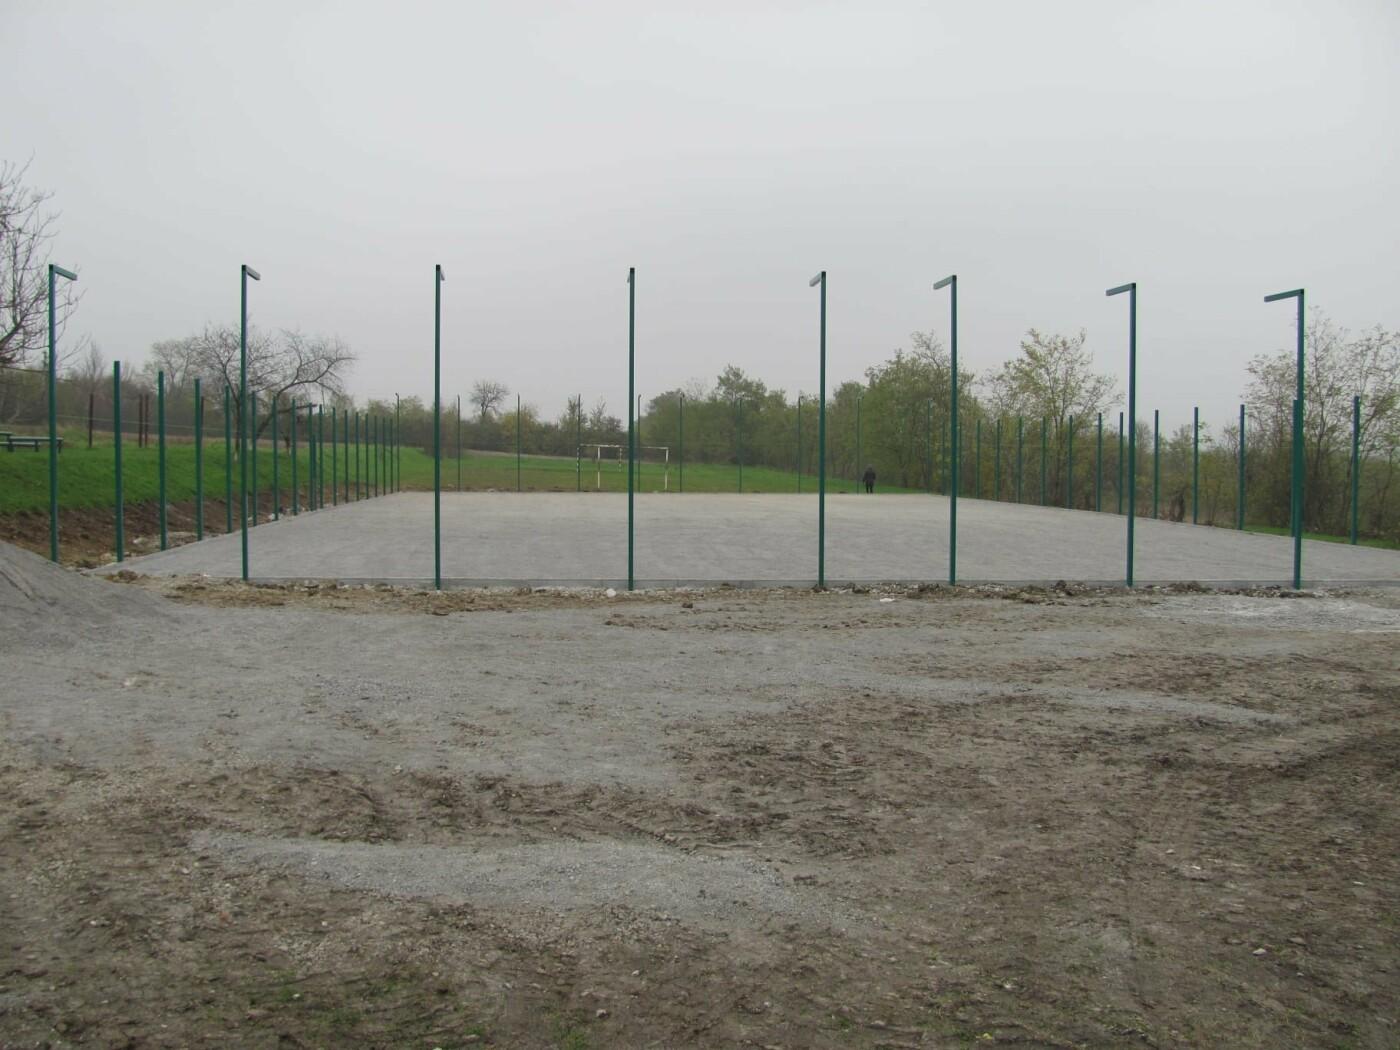 Встановлення мультифункціонального спортивного майданчика, який включатиме в себе футбольне та волейбольне поля, Фото: Кам'янець-Подільська РДА